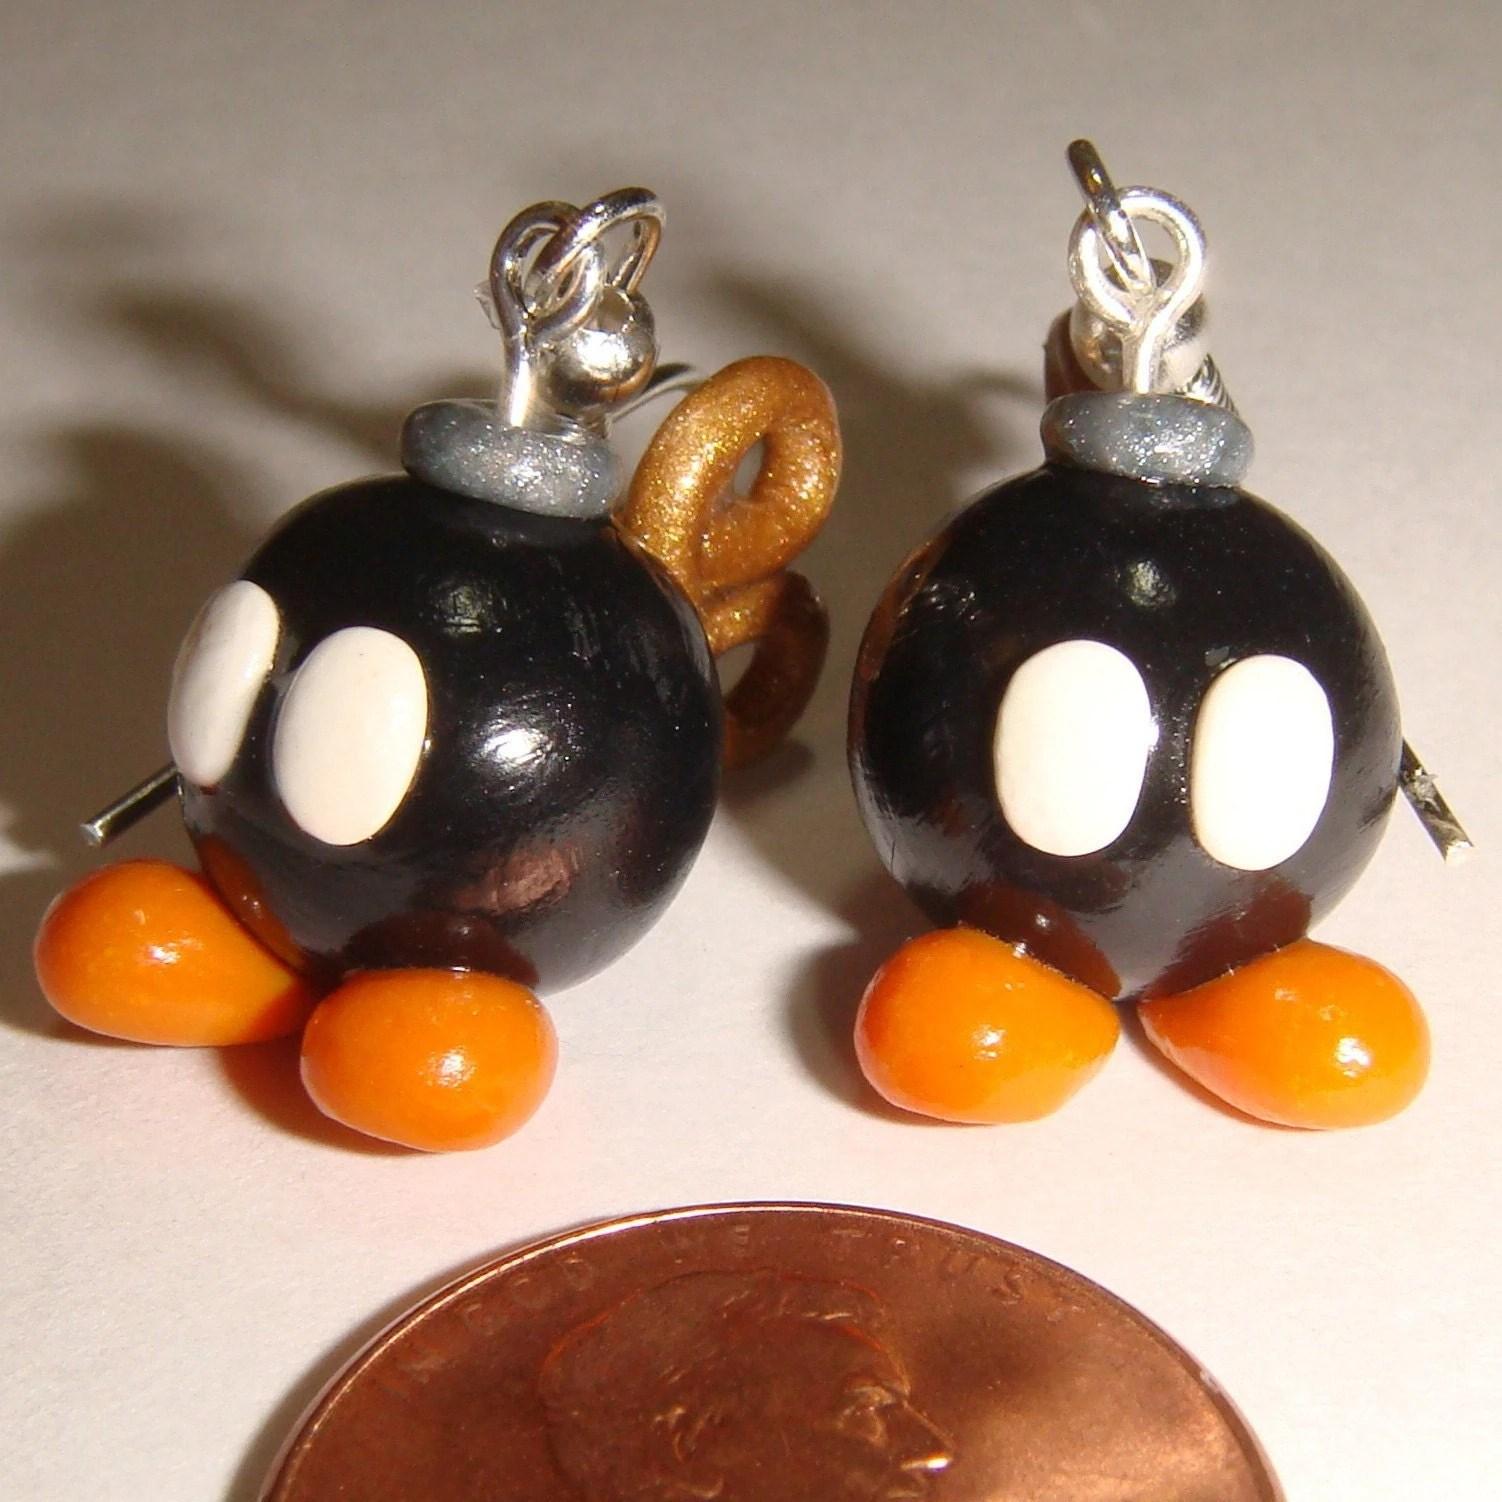 Super Mario Brothers Bob-omb bomb Earrings